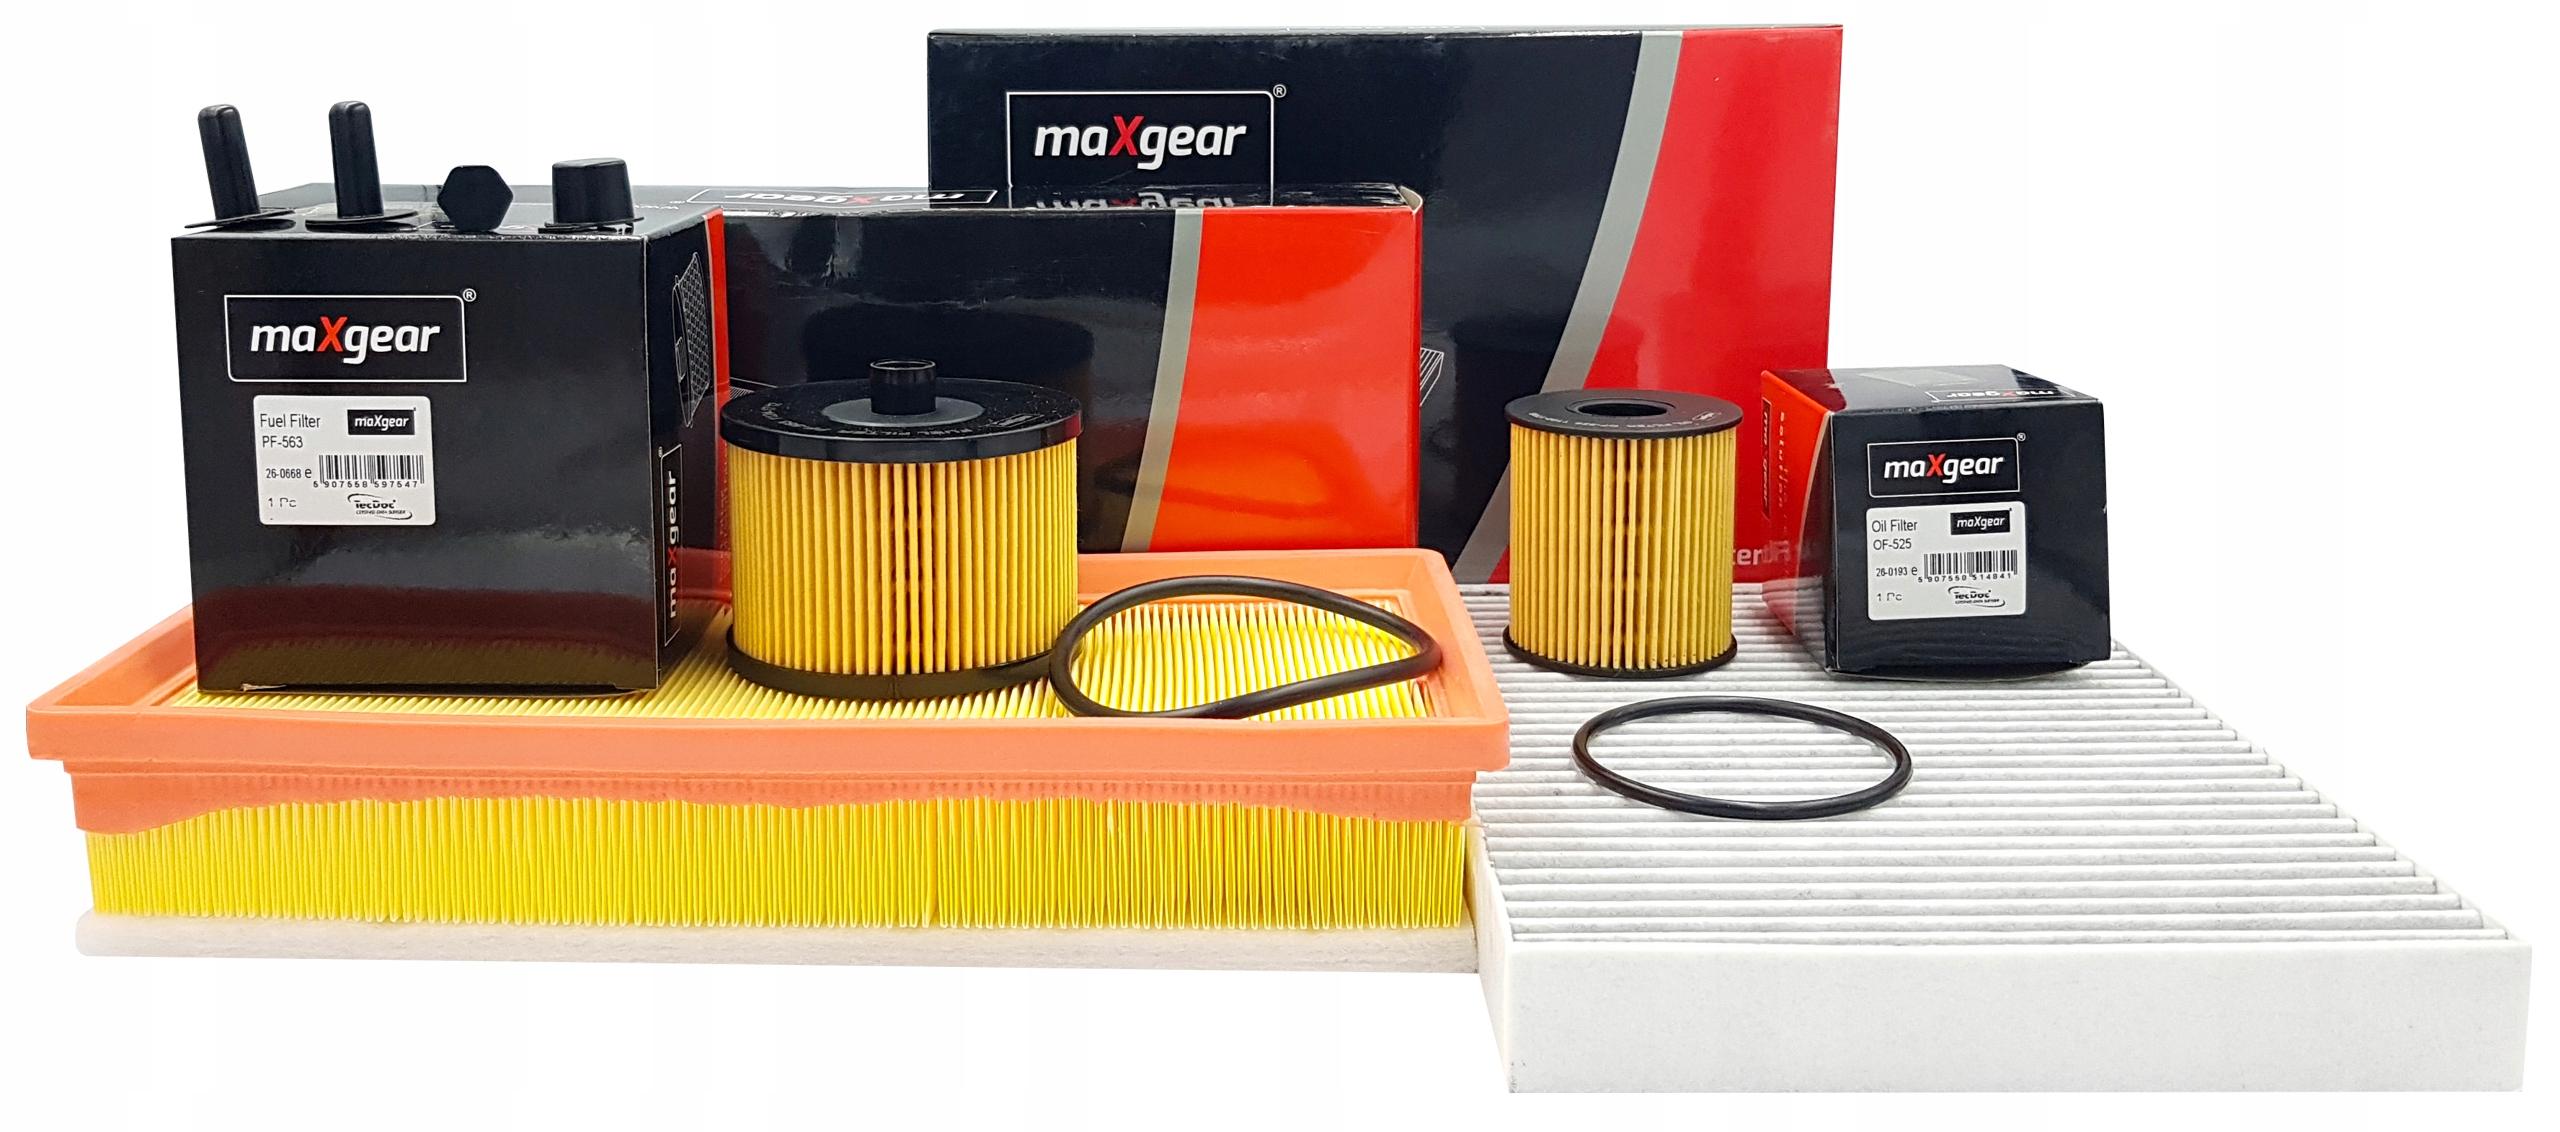 citroen c5 iii 20 hdi комплект фильтры maxgear